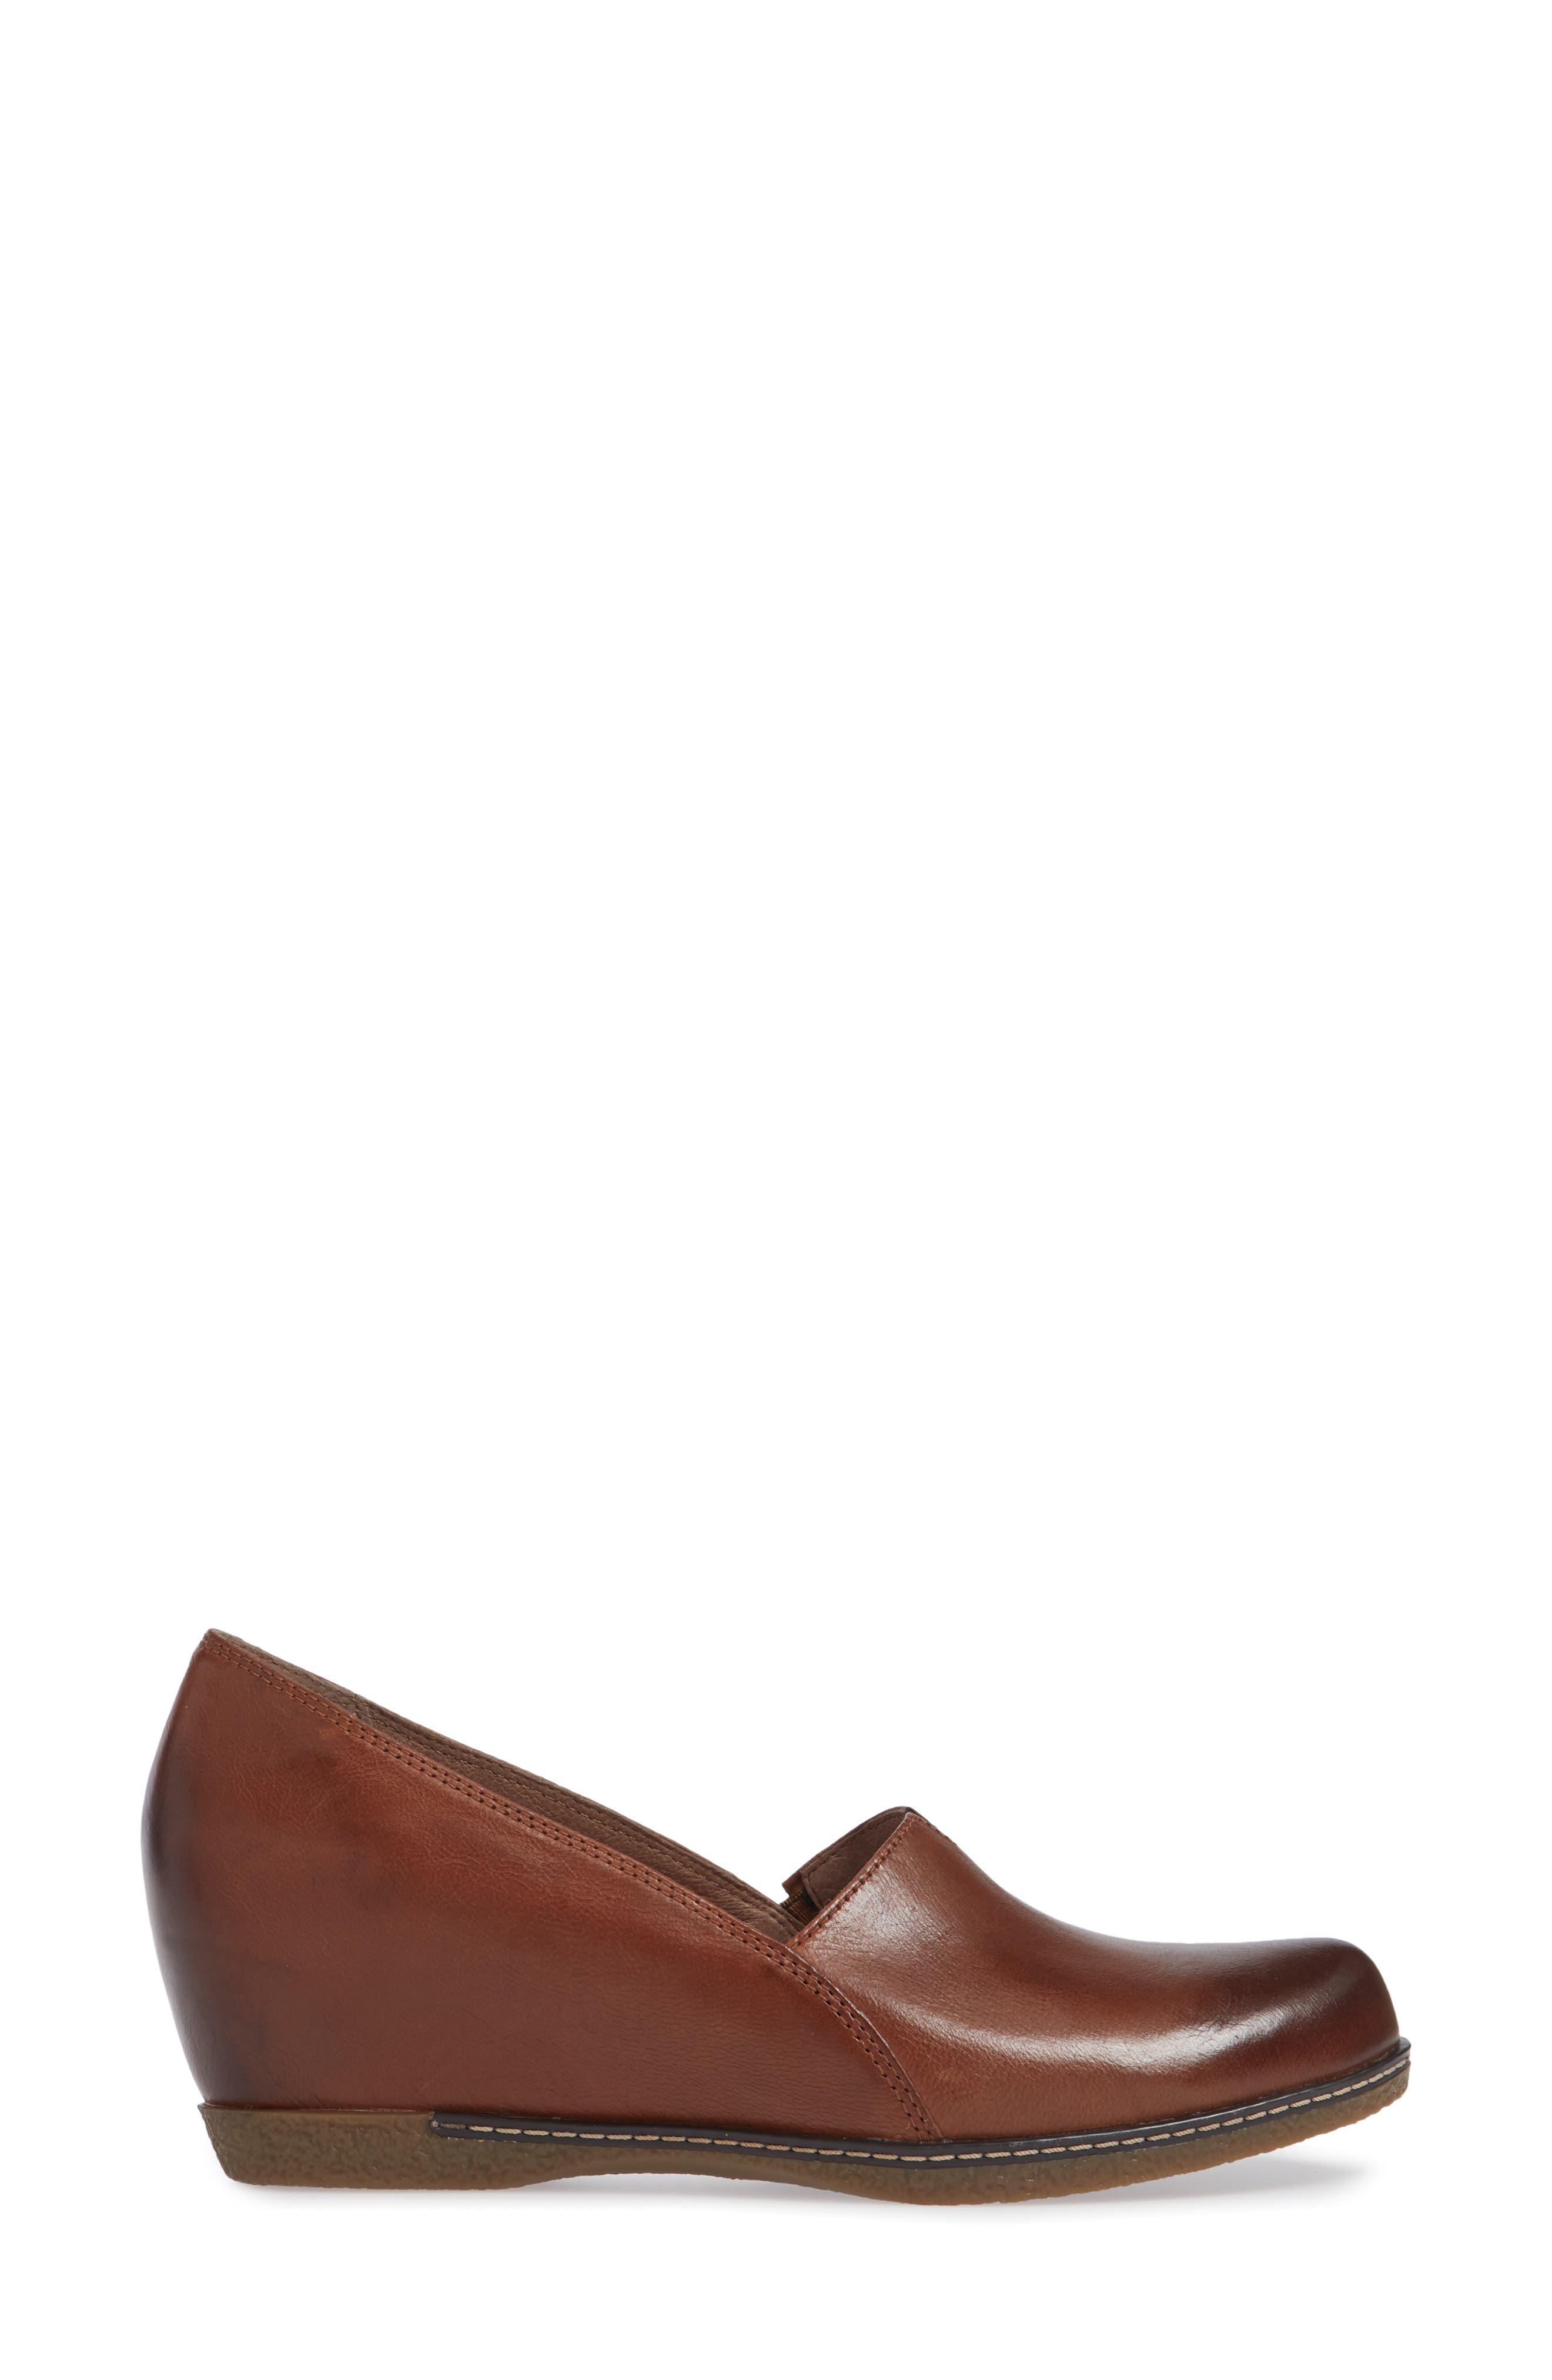 Liliana Concealed Wedge Slip-On,                             Alternate thumbnail 6, color,                             Chestnut Burnished Leather